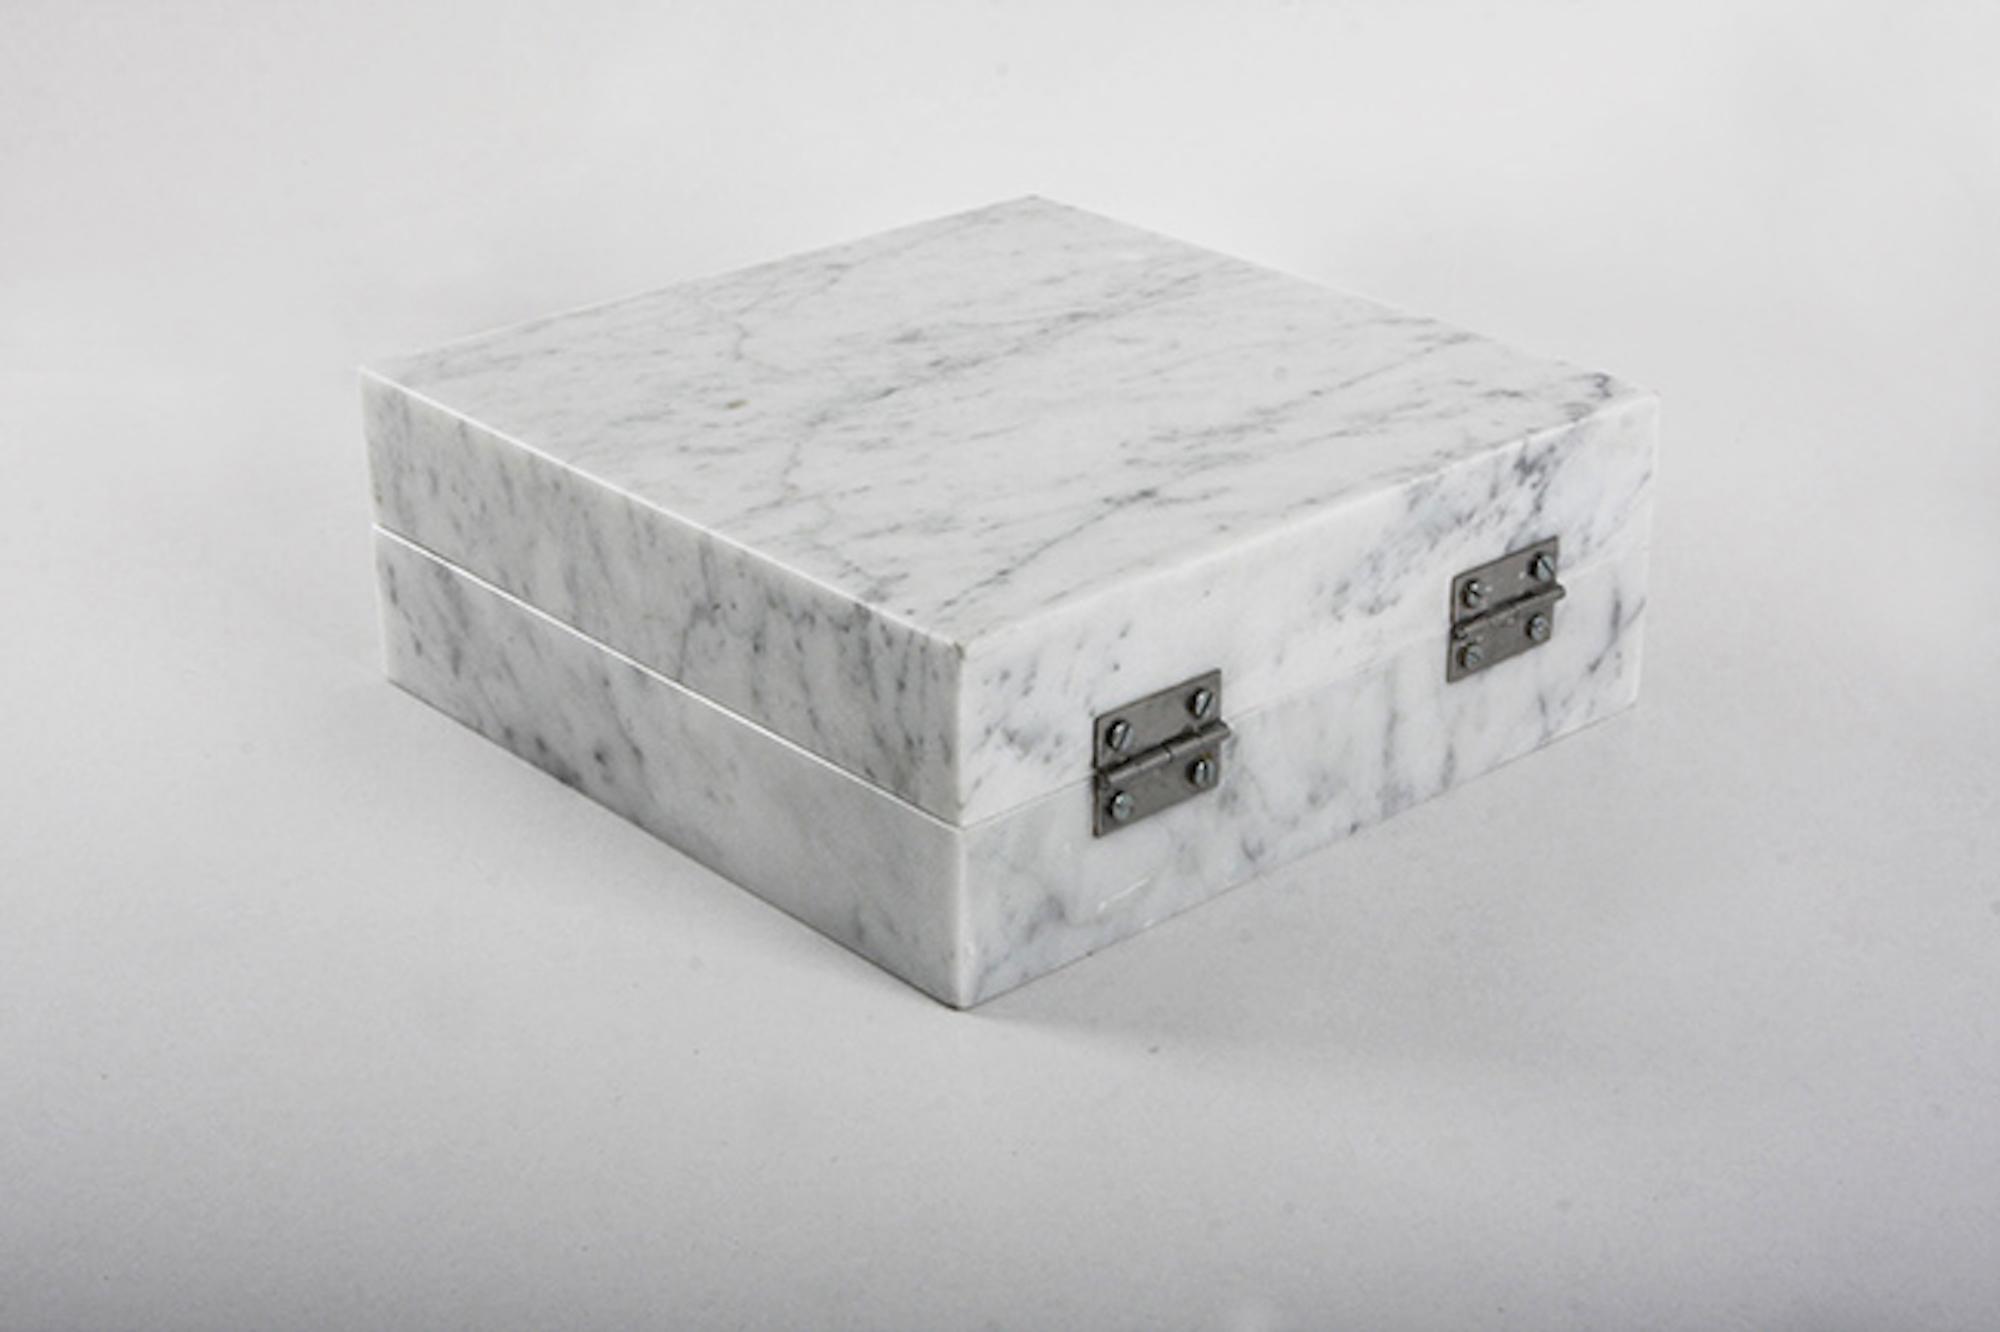 Night Enclosed in Marble (detail) 2012 – 2016 Carrara marble 1cm3 of night of Kadisha valley Lebanon, hinges 23 x 23 x 9 cm